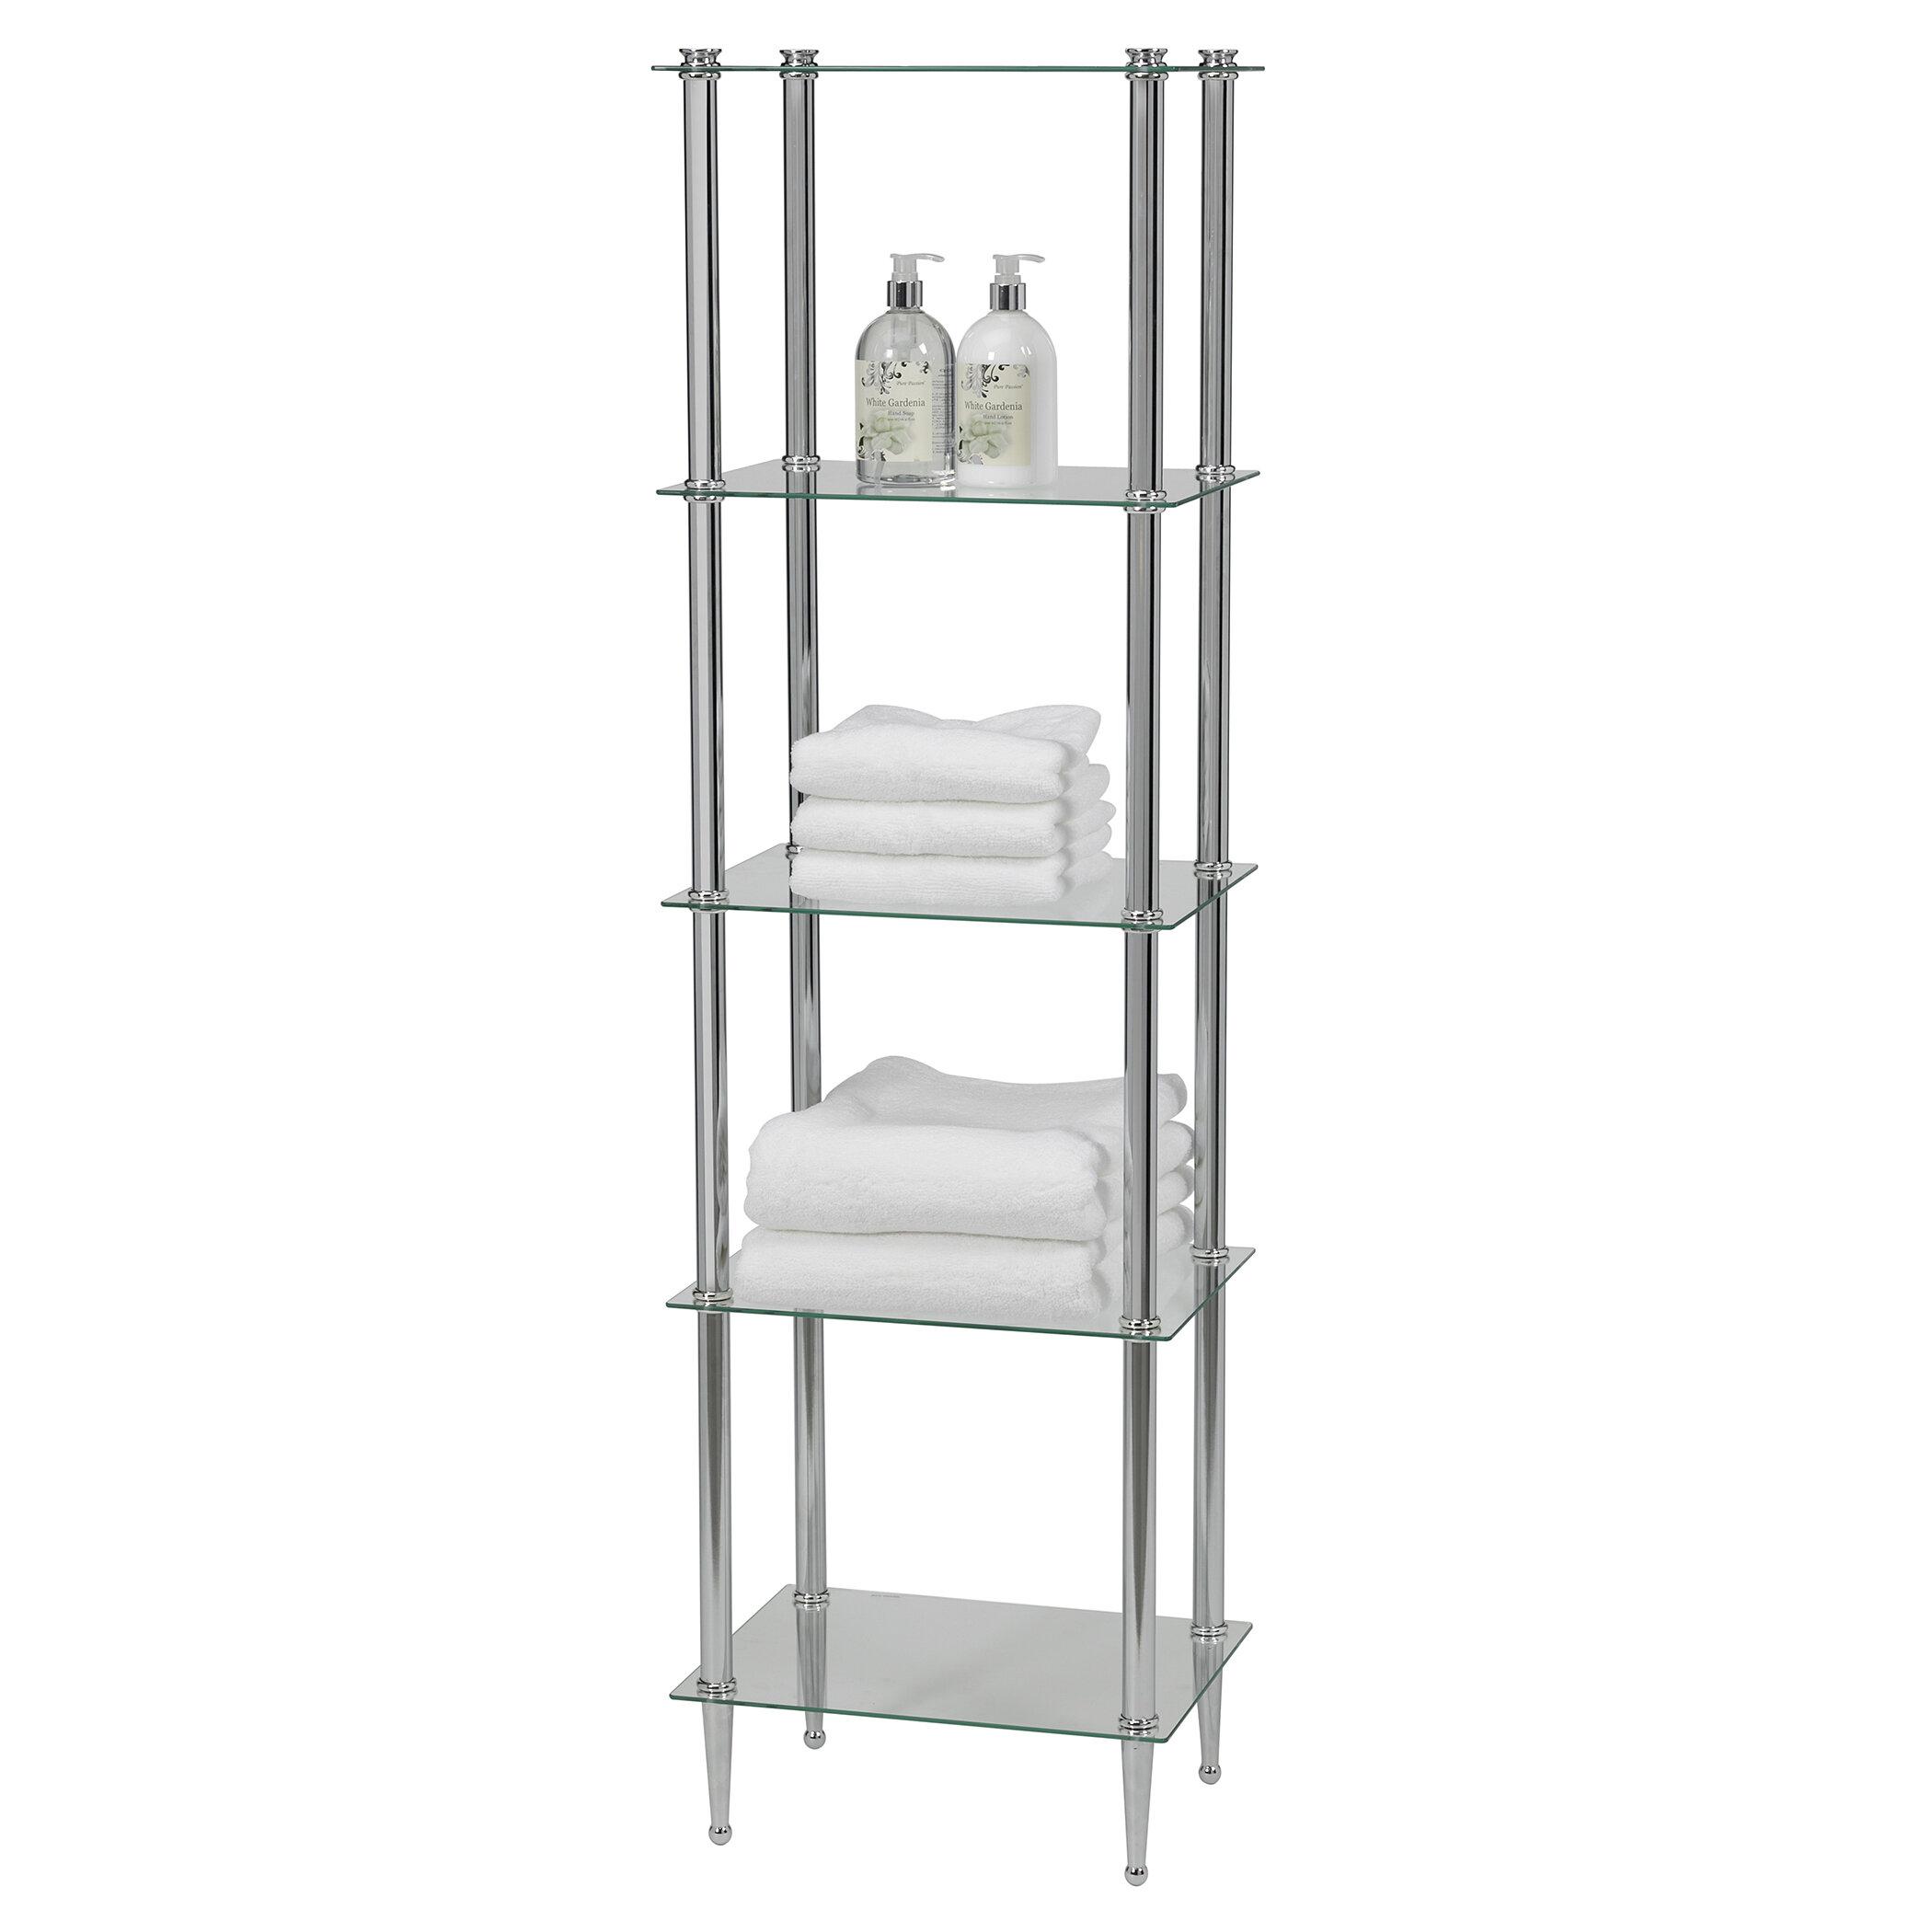 Rebrilliant Sciortino 16 W X 55 H X 12 D Metal Free Standing Bathroom Shelves Reviews Wayfair